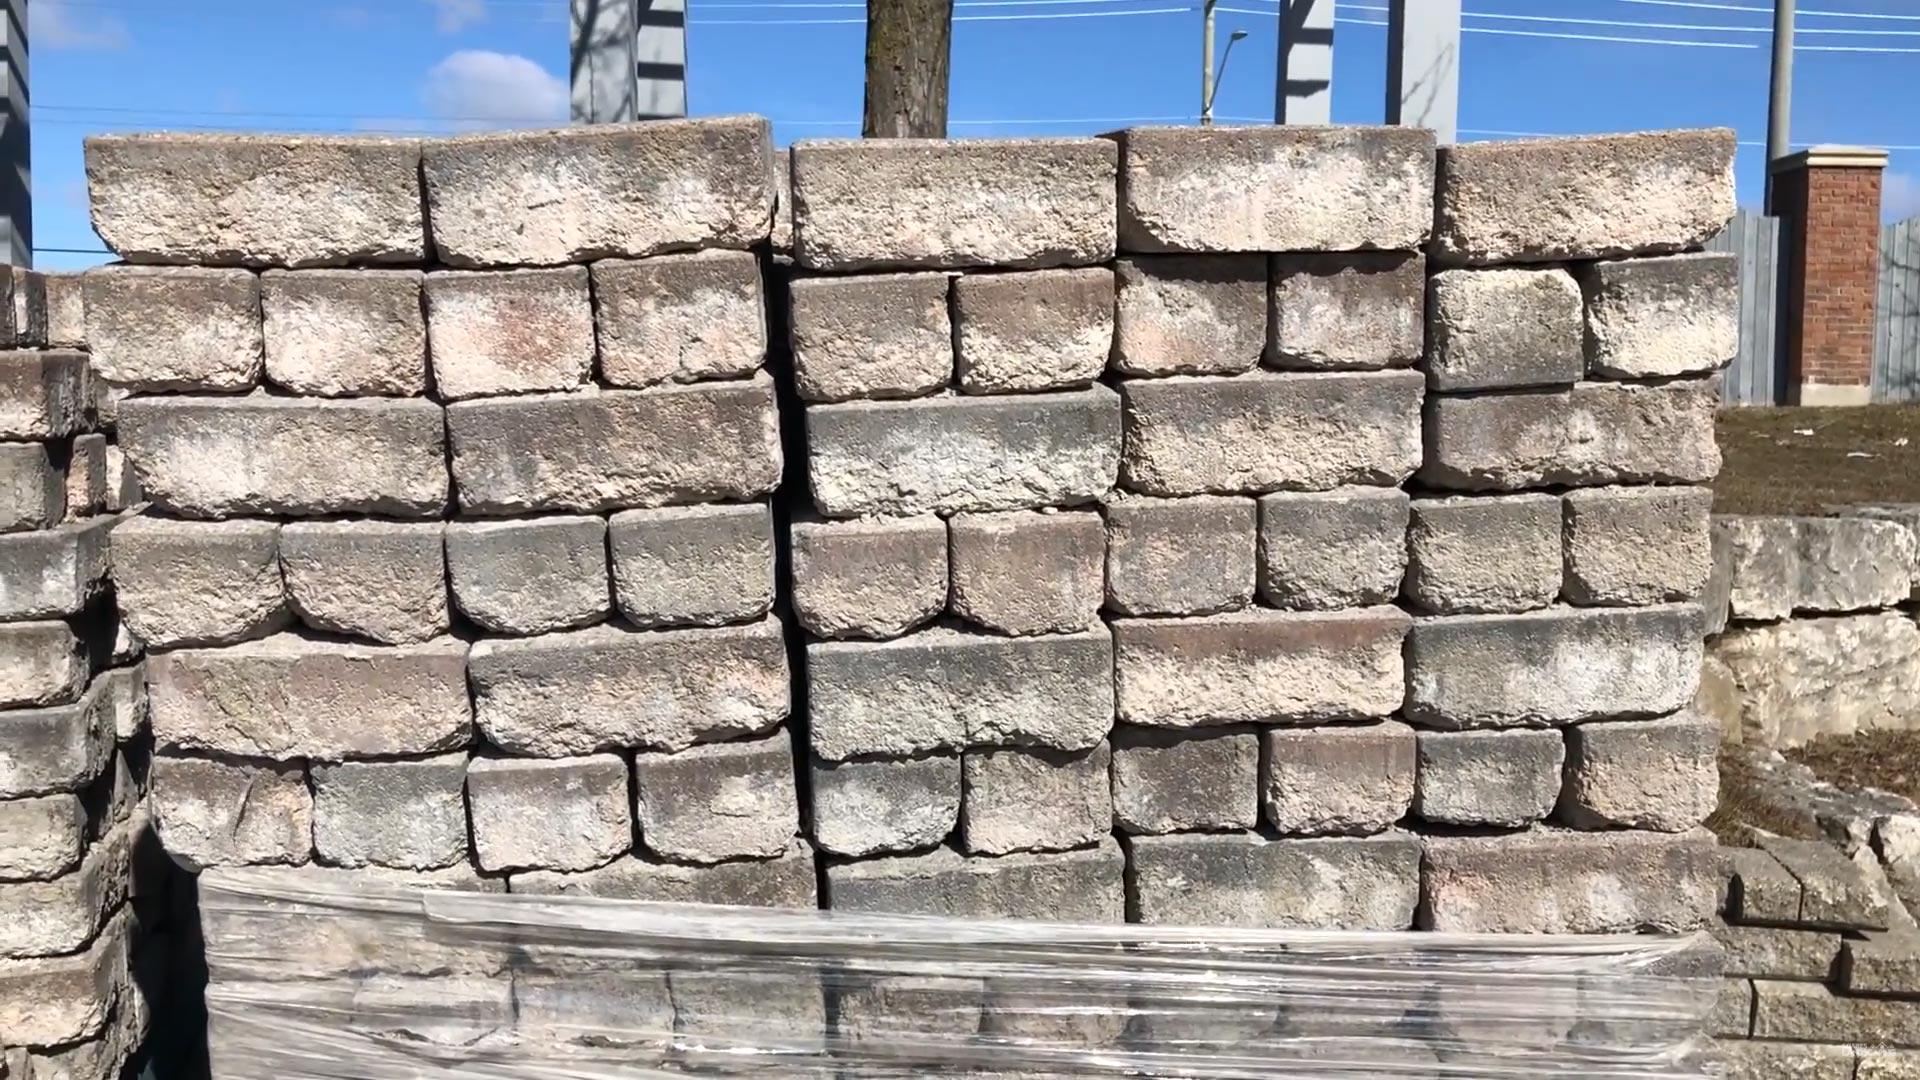 Concrete pavers degraded